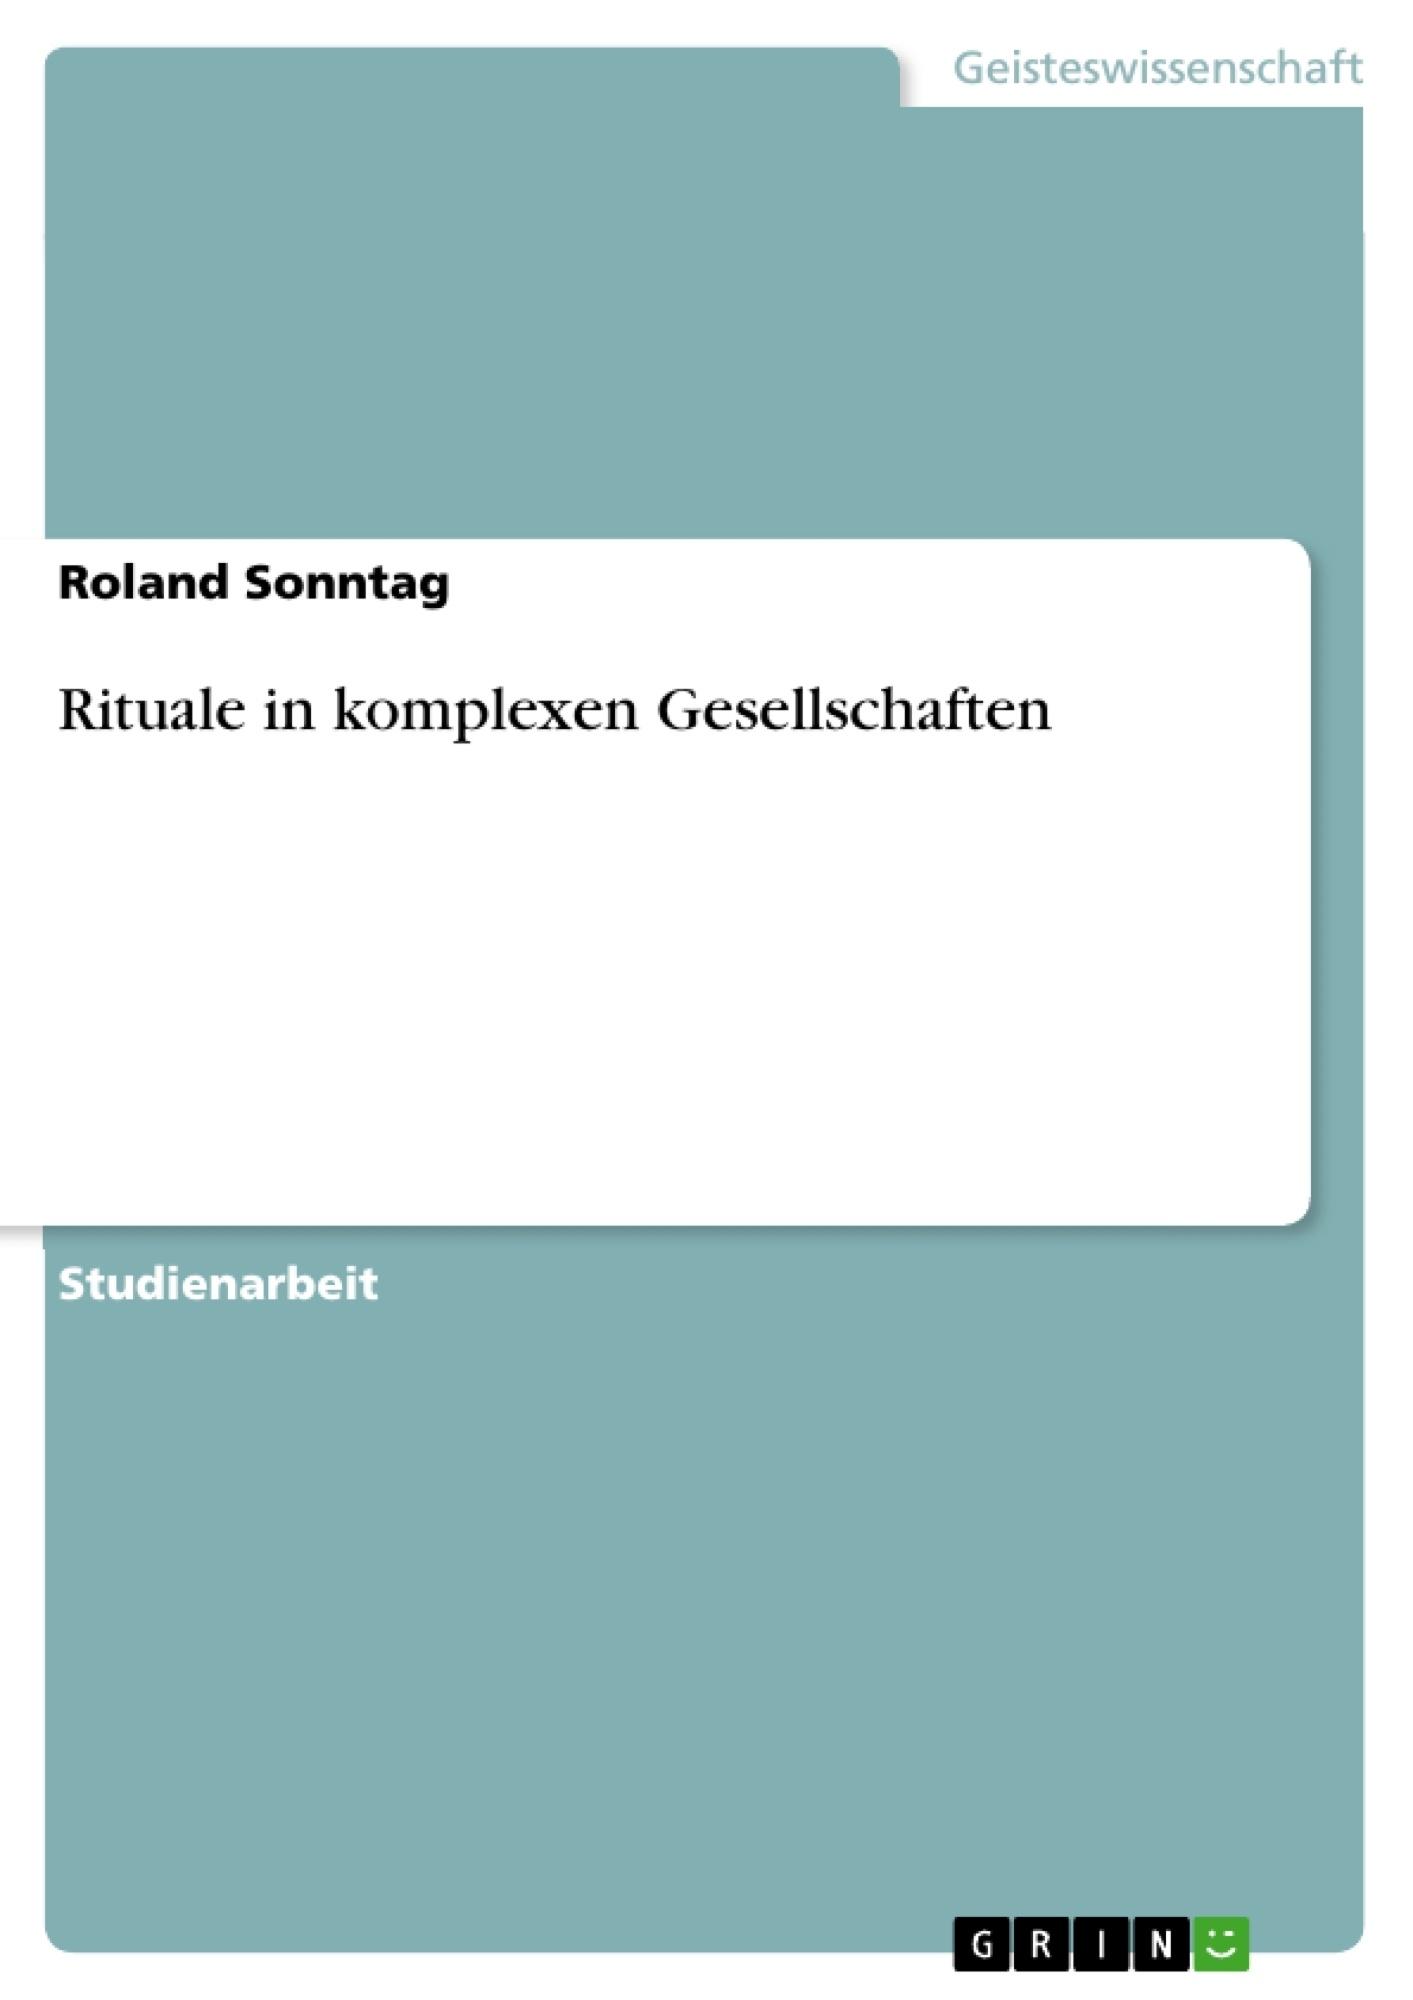 Titel: Rituale in komplexen Gesellschaften